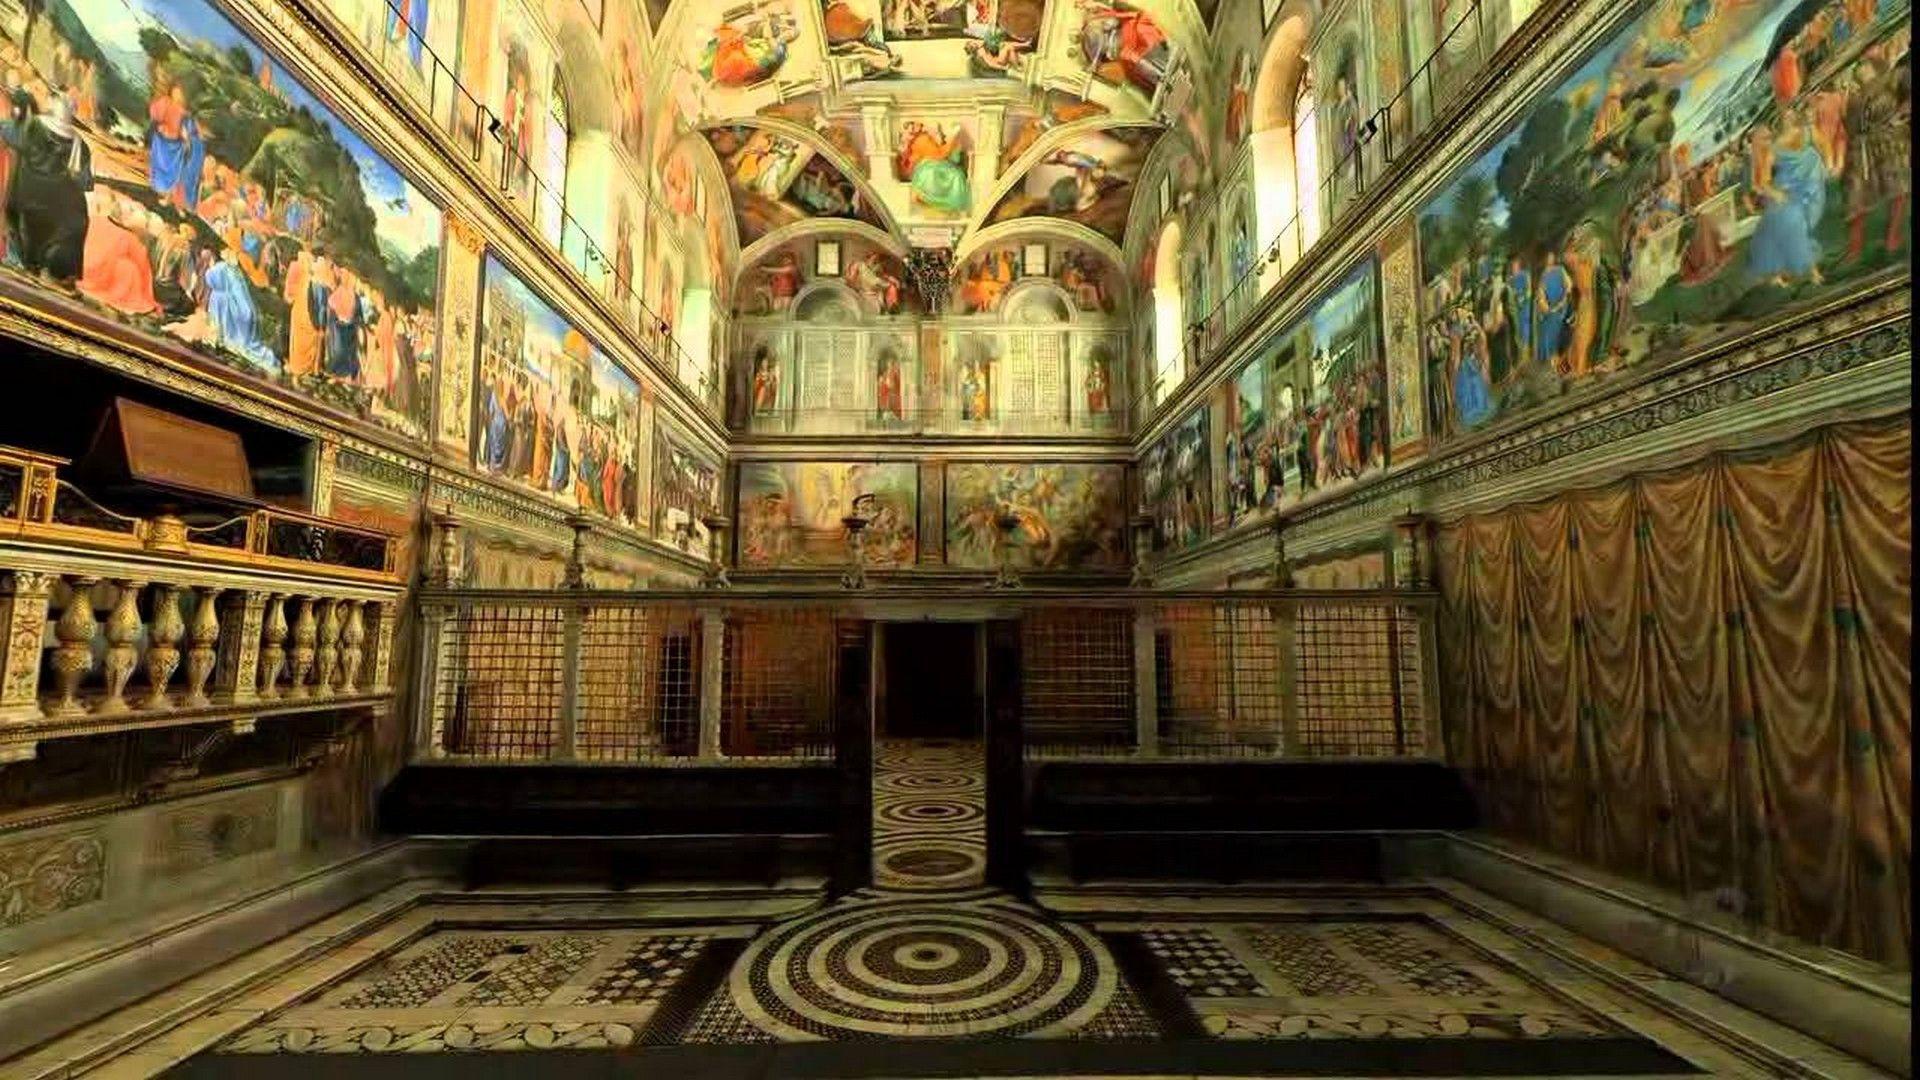 sistine chapel wallpaper Sistine Chapel wallpaper 1920x1080